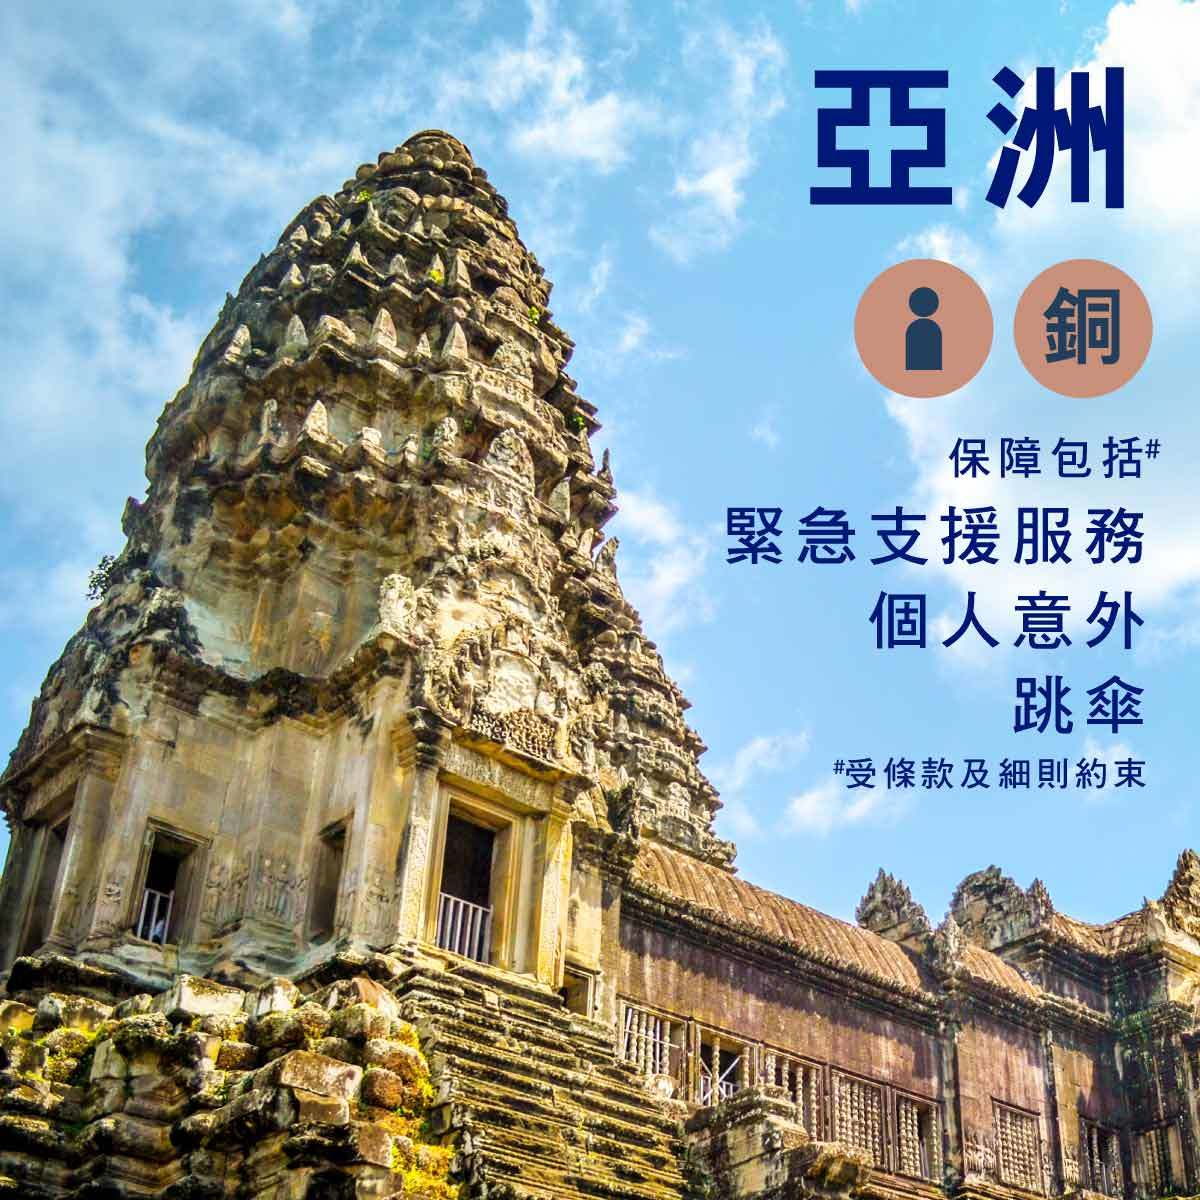 Asia - Single Trip Individual Travel Insurance